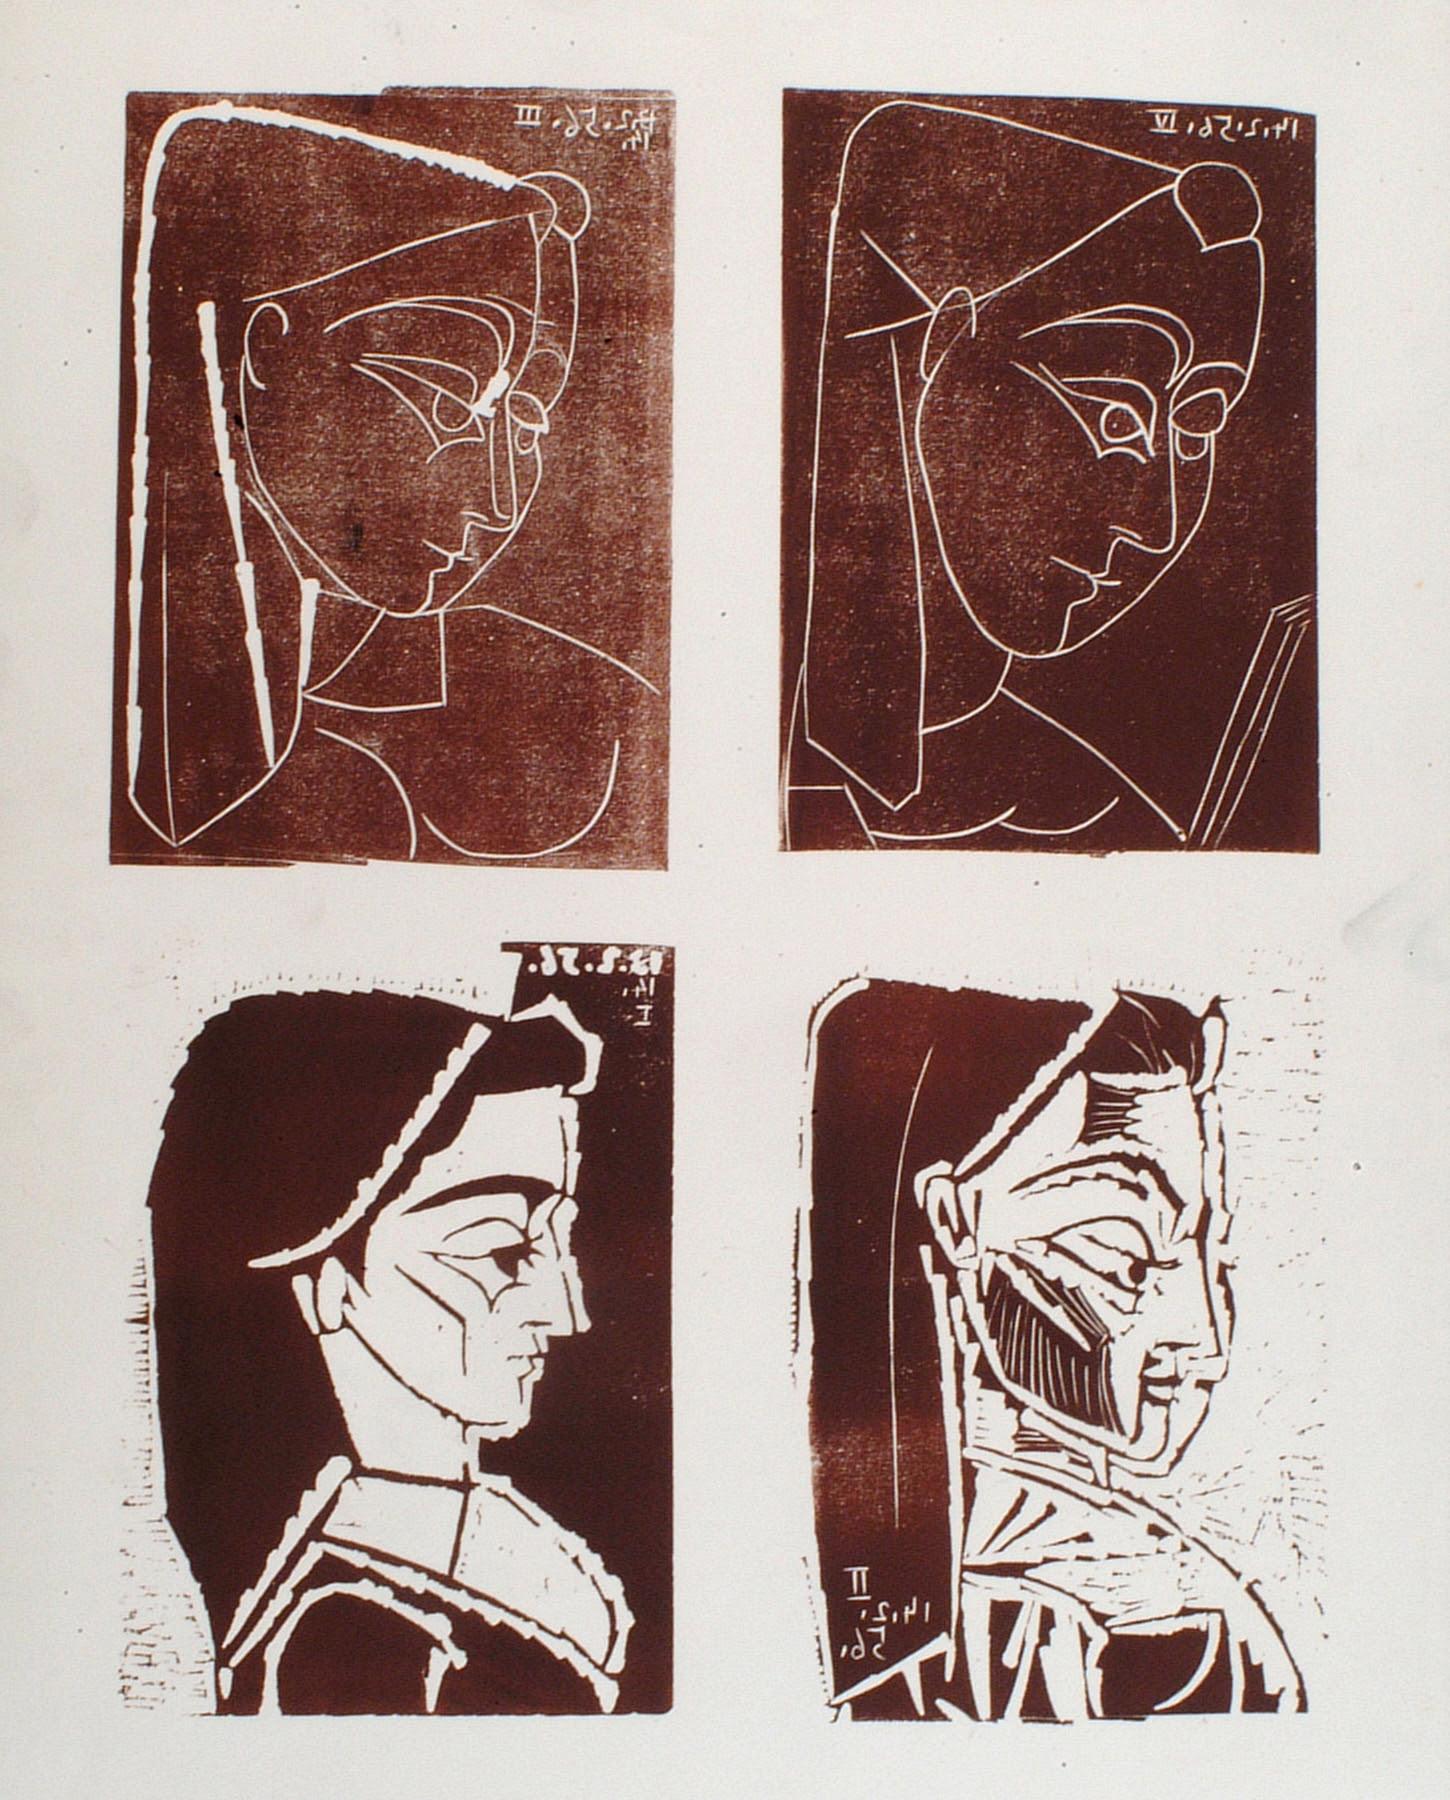 fine art print by Pablo Picasso, Profil de Jacqueline I, II, III, IV, 1956